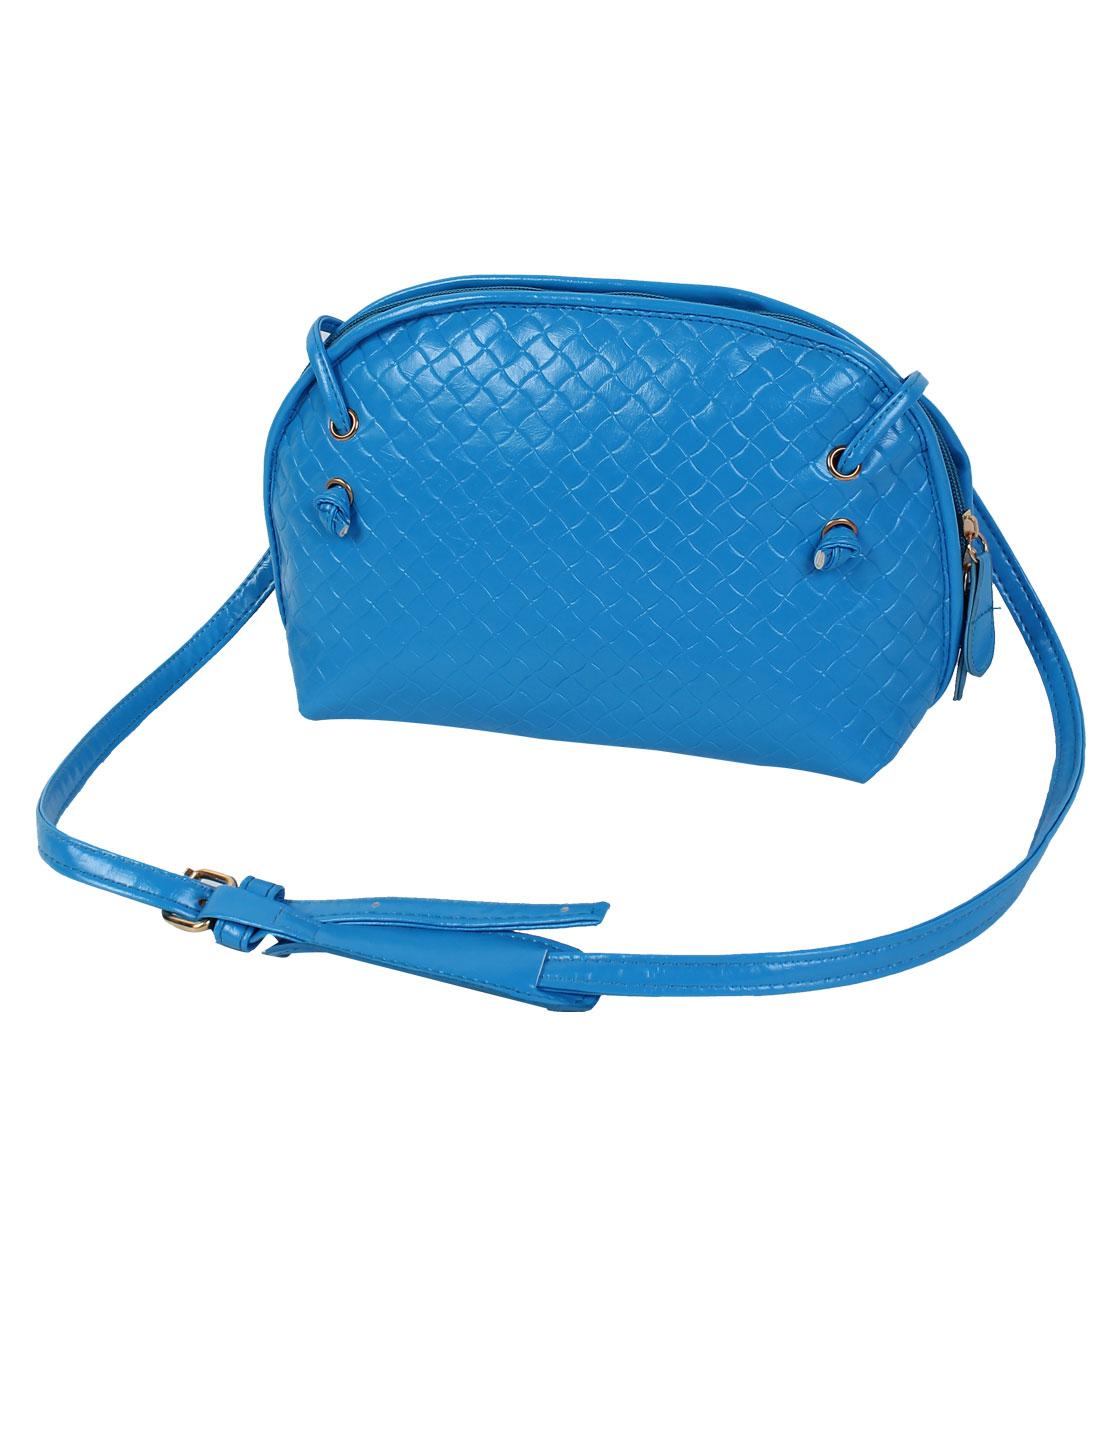 Women PU Tote Satchel Messenger Bag Casual Purse Cross Body Shoulder Handbag Blue